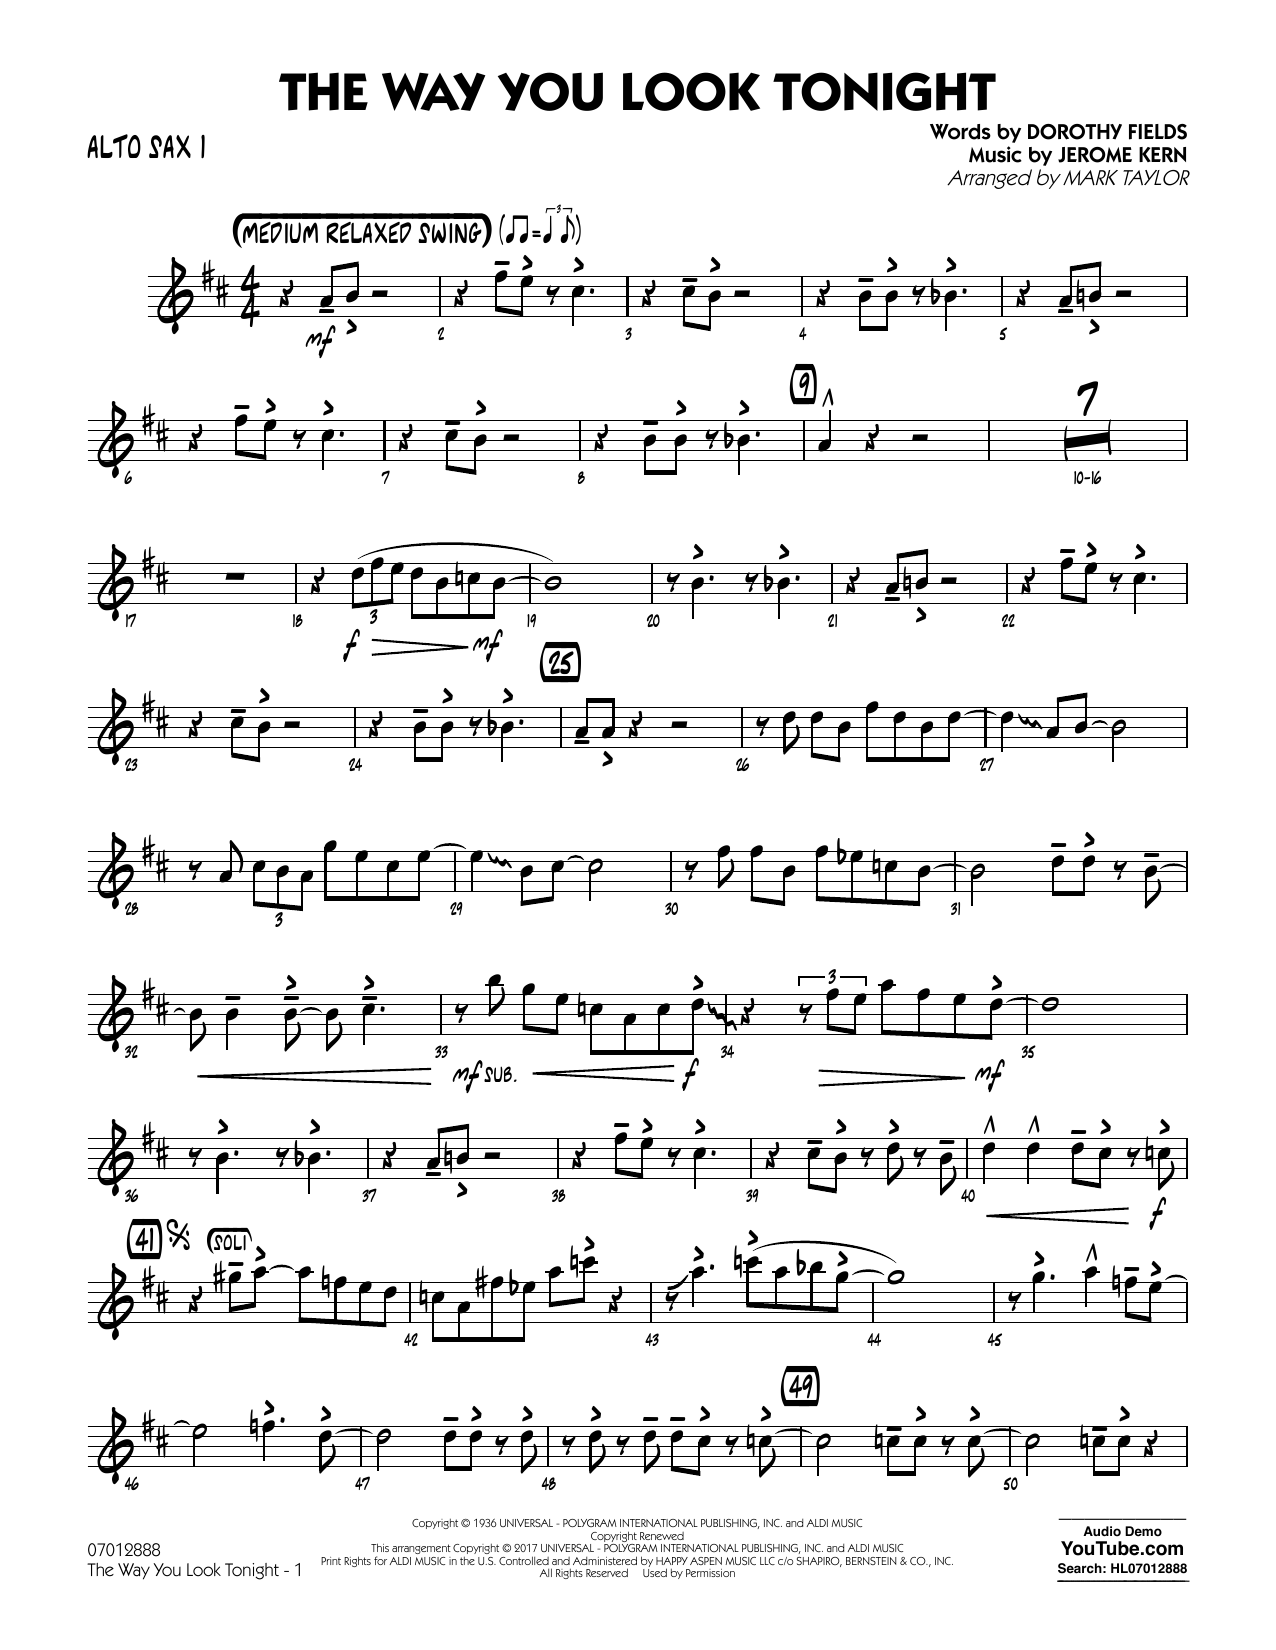 Jerome Kern - The Way You Look Tonight - Alto Sax 1